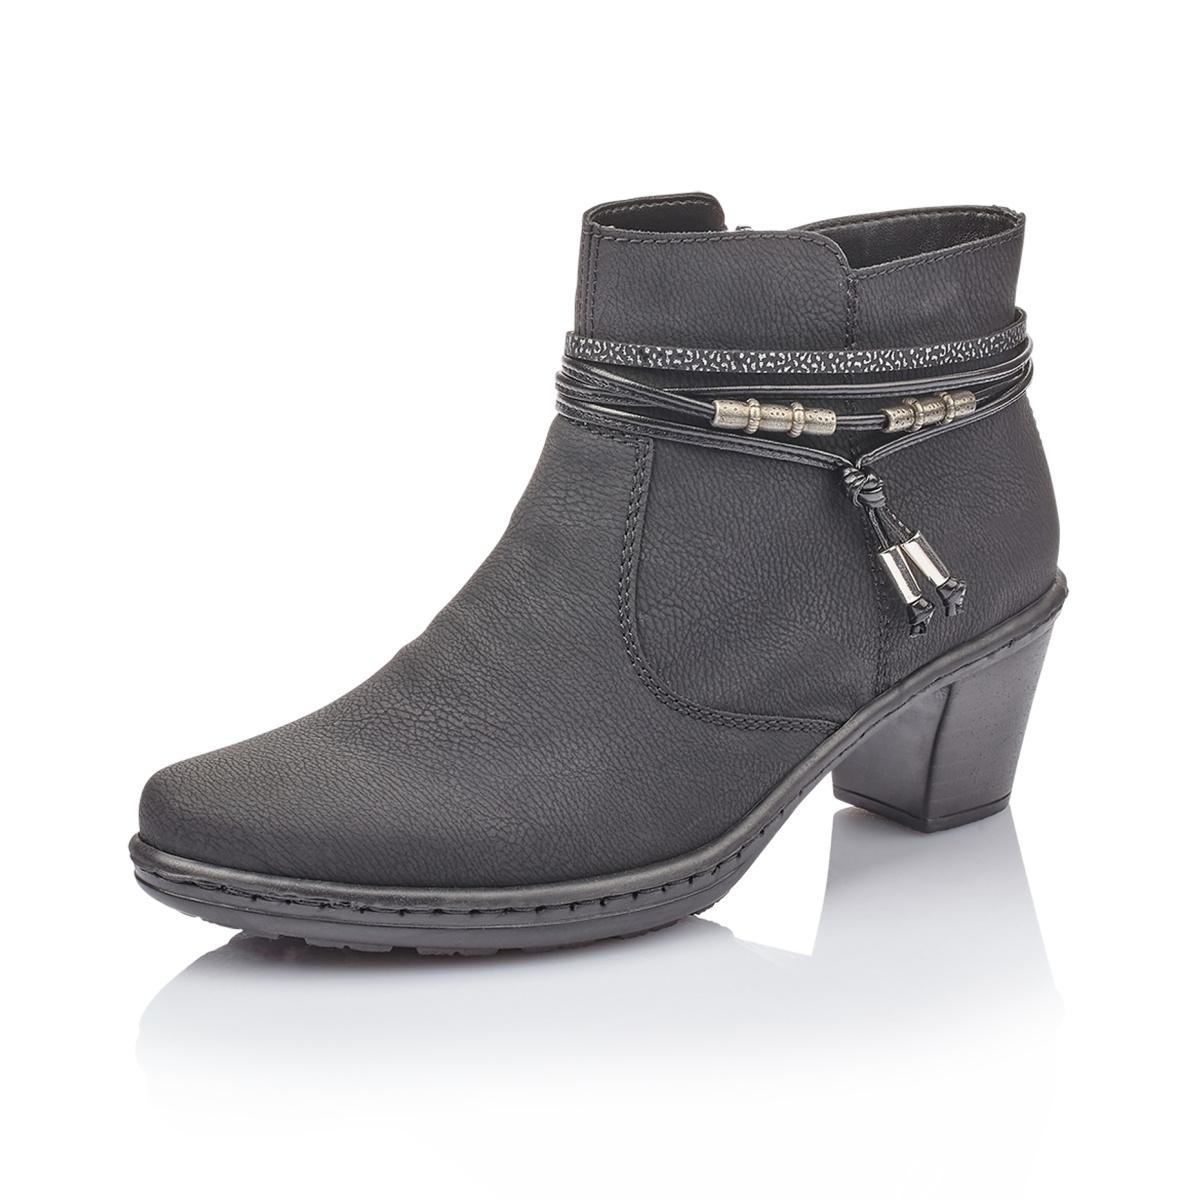 Dámská obuv RIEKER54953 00 SCHWARZ KOMBI H W 8  f954e1edf17